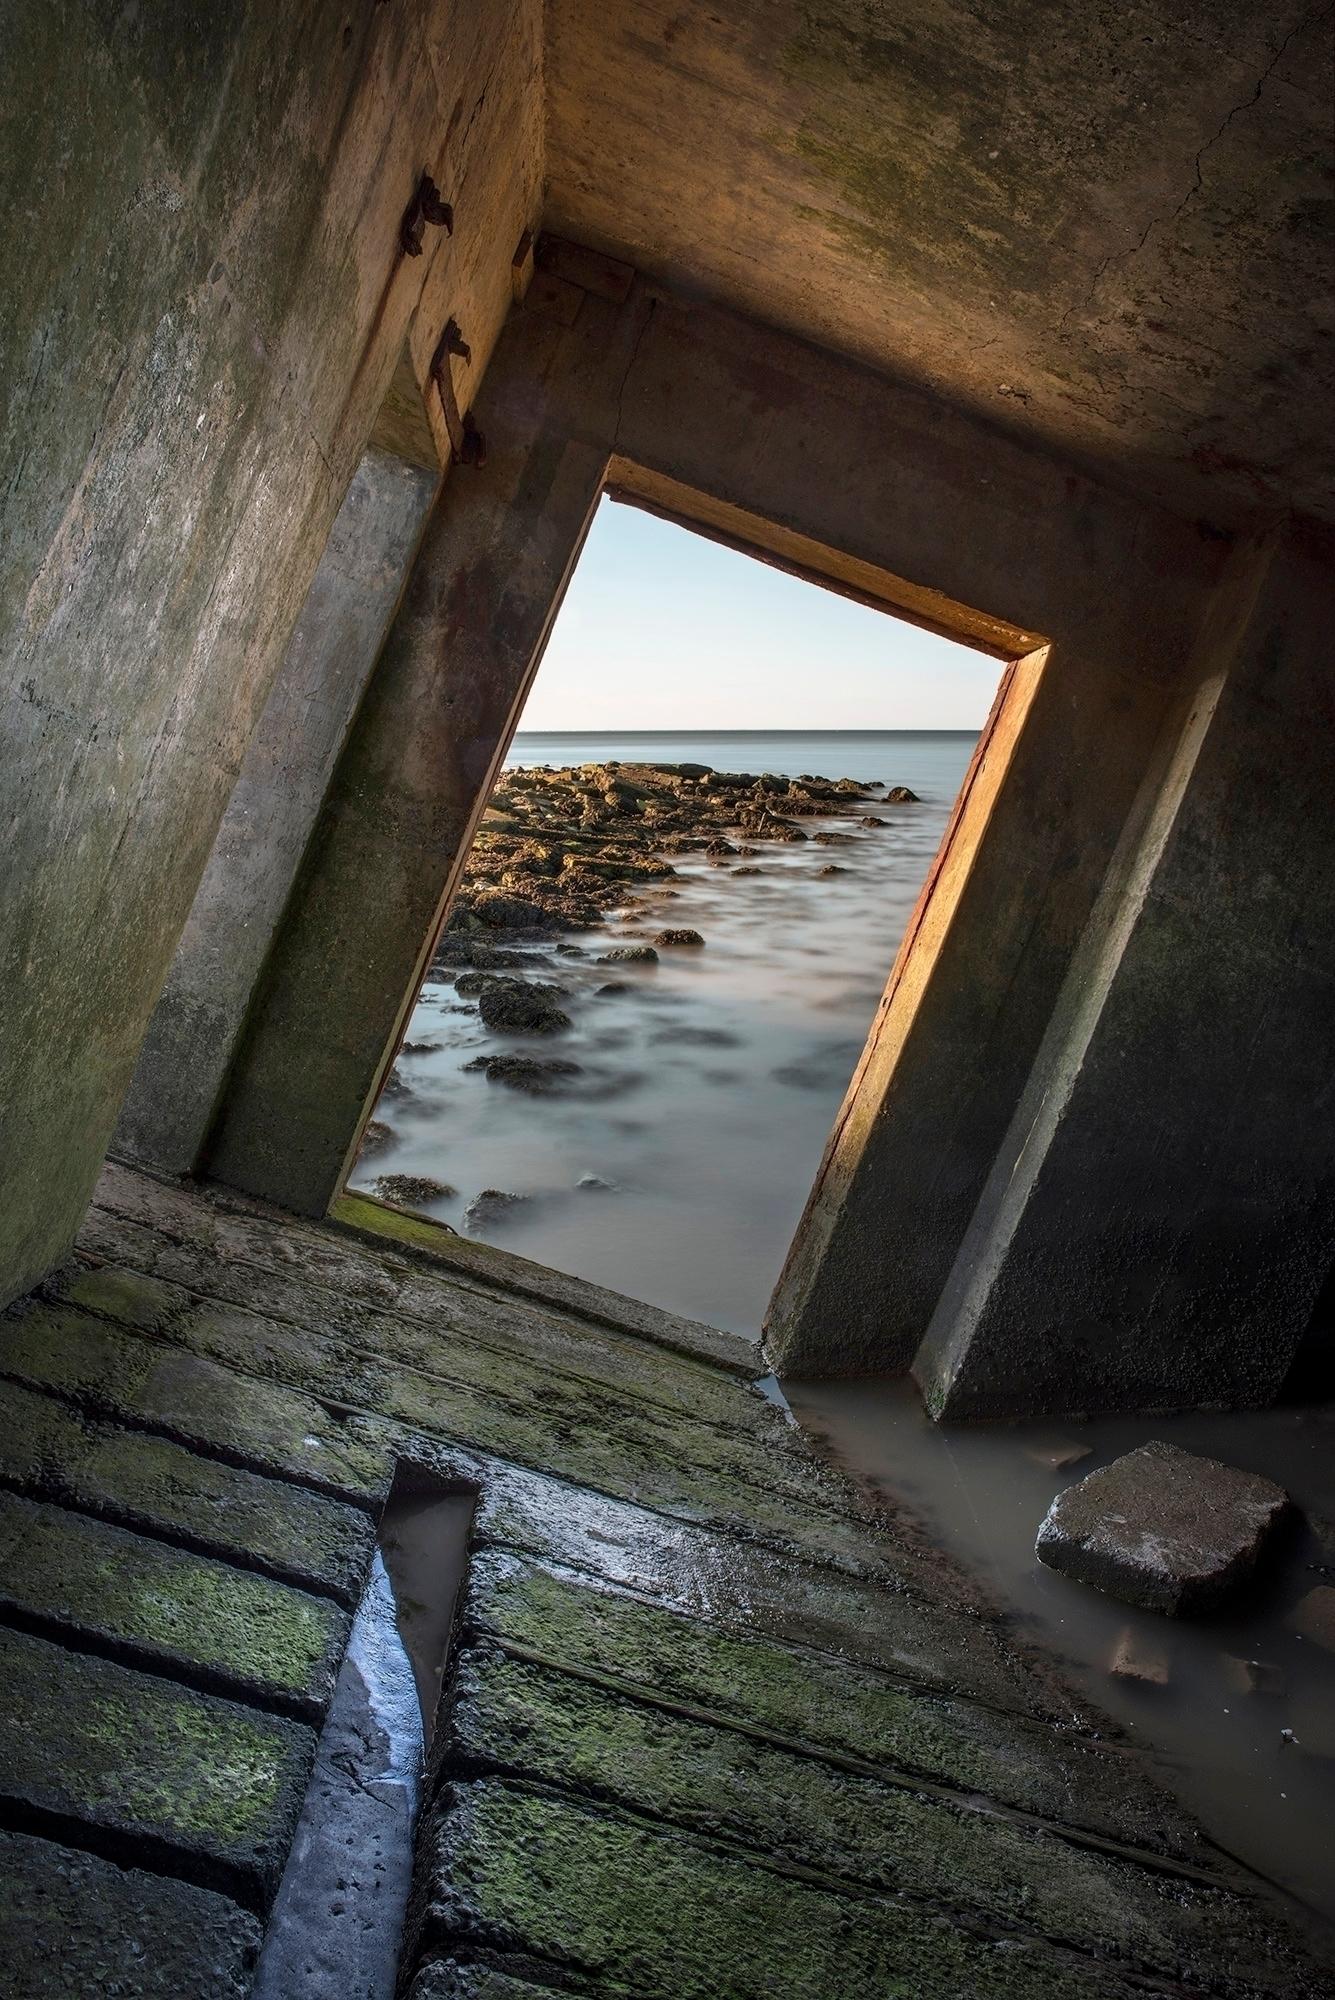 Warden Point Isle Sheppey 3 bui - forgottenheritage | ello